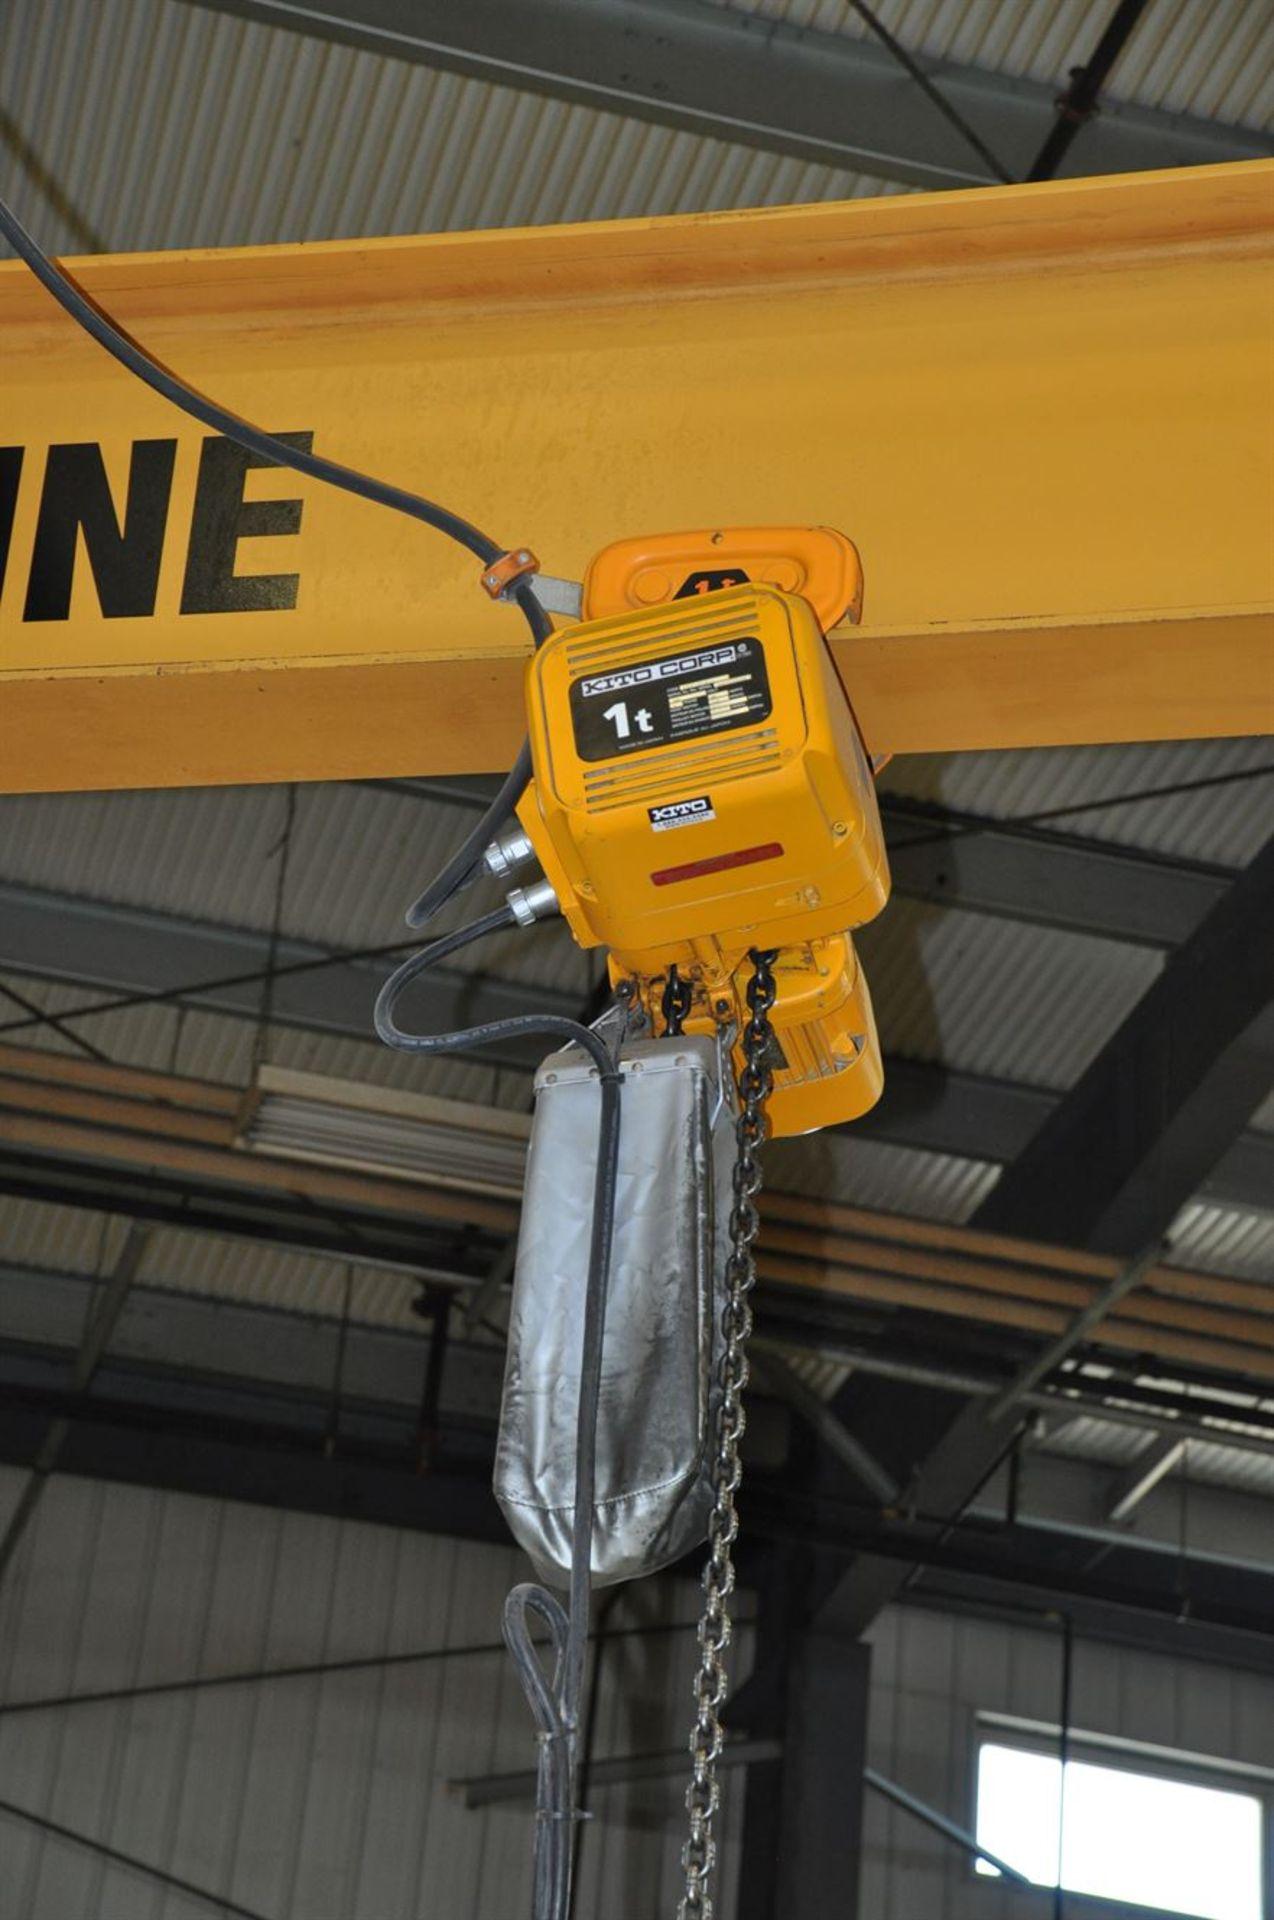 TEKO 1 Tonne Free Standing Jib Crane w/ KITO 1 Tonne Electric Chain Hoist - Image 2 of 2